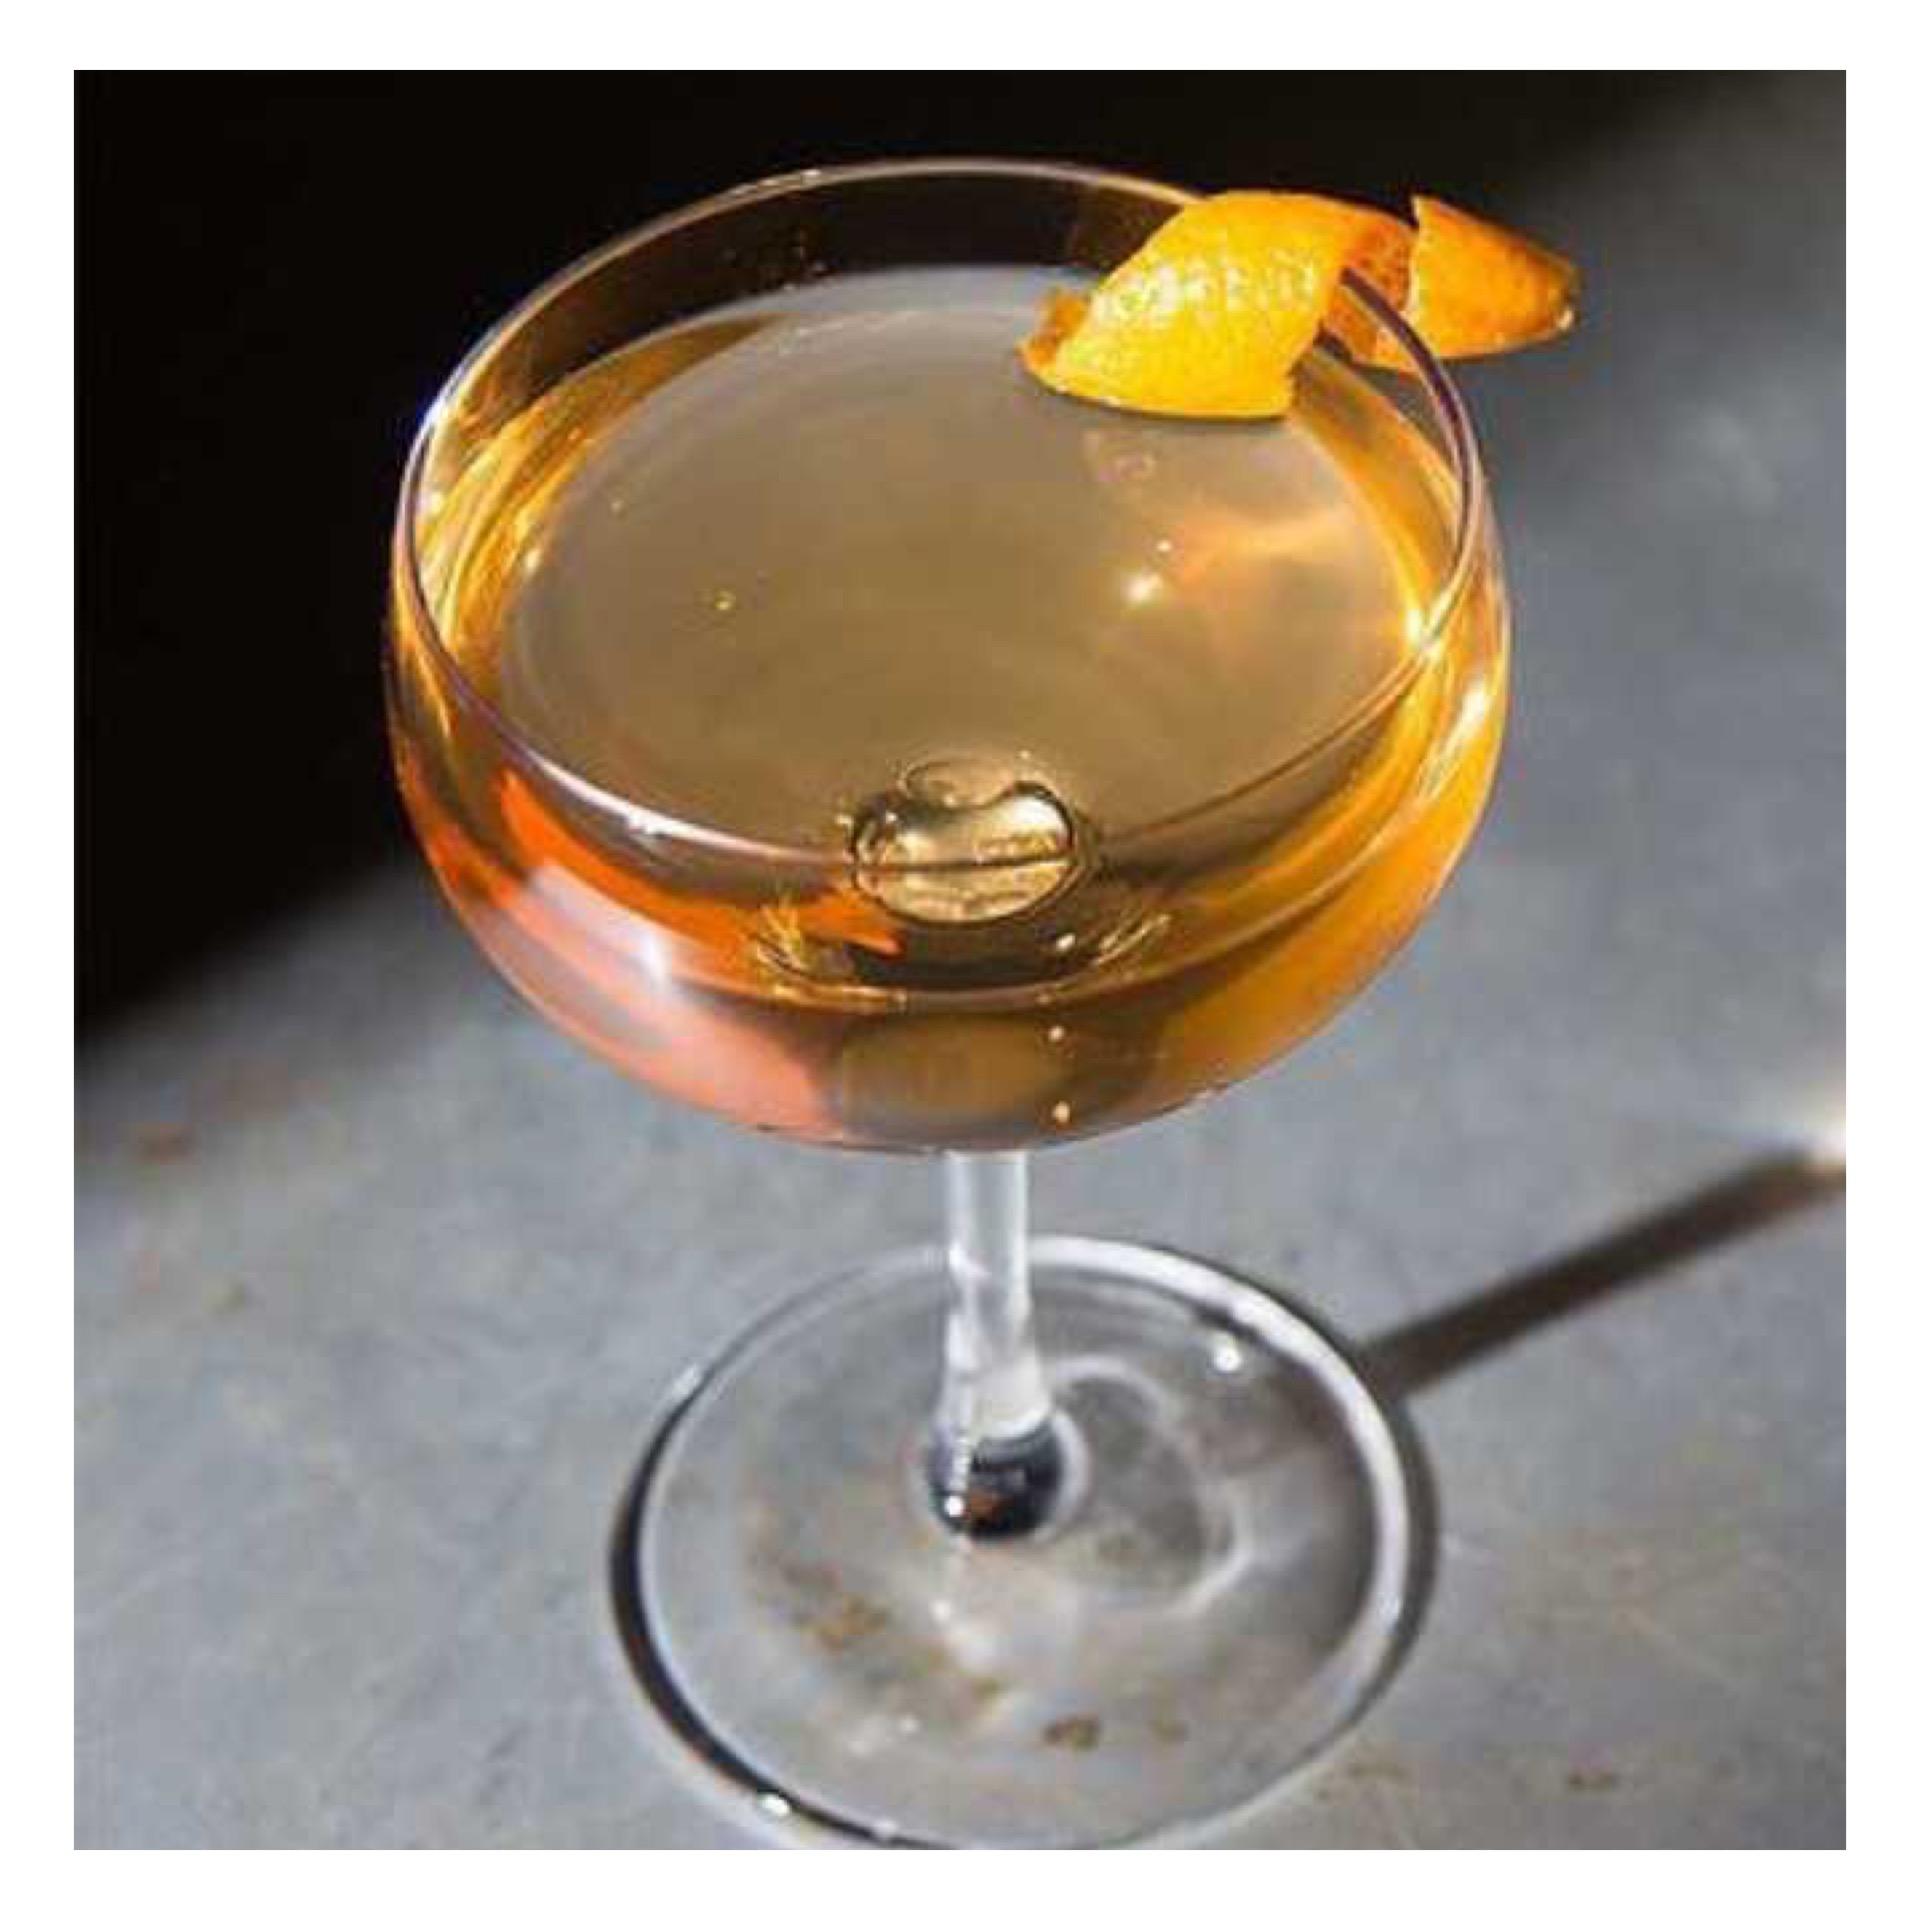 Drifter_Website_Cocktail_Svol_Danish_Martini.jpg